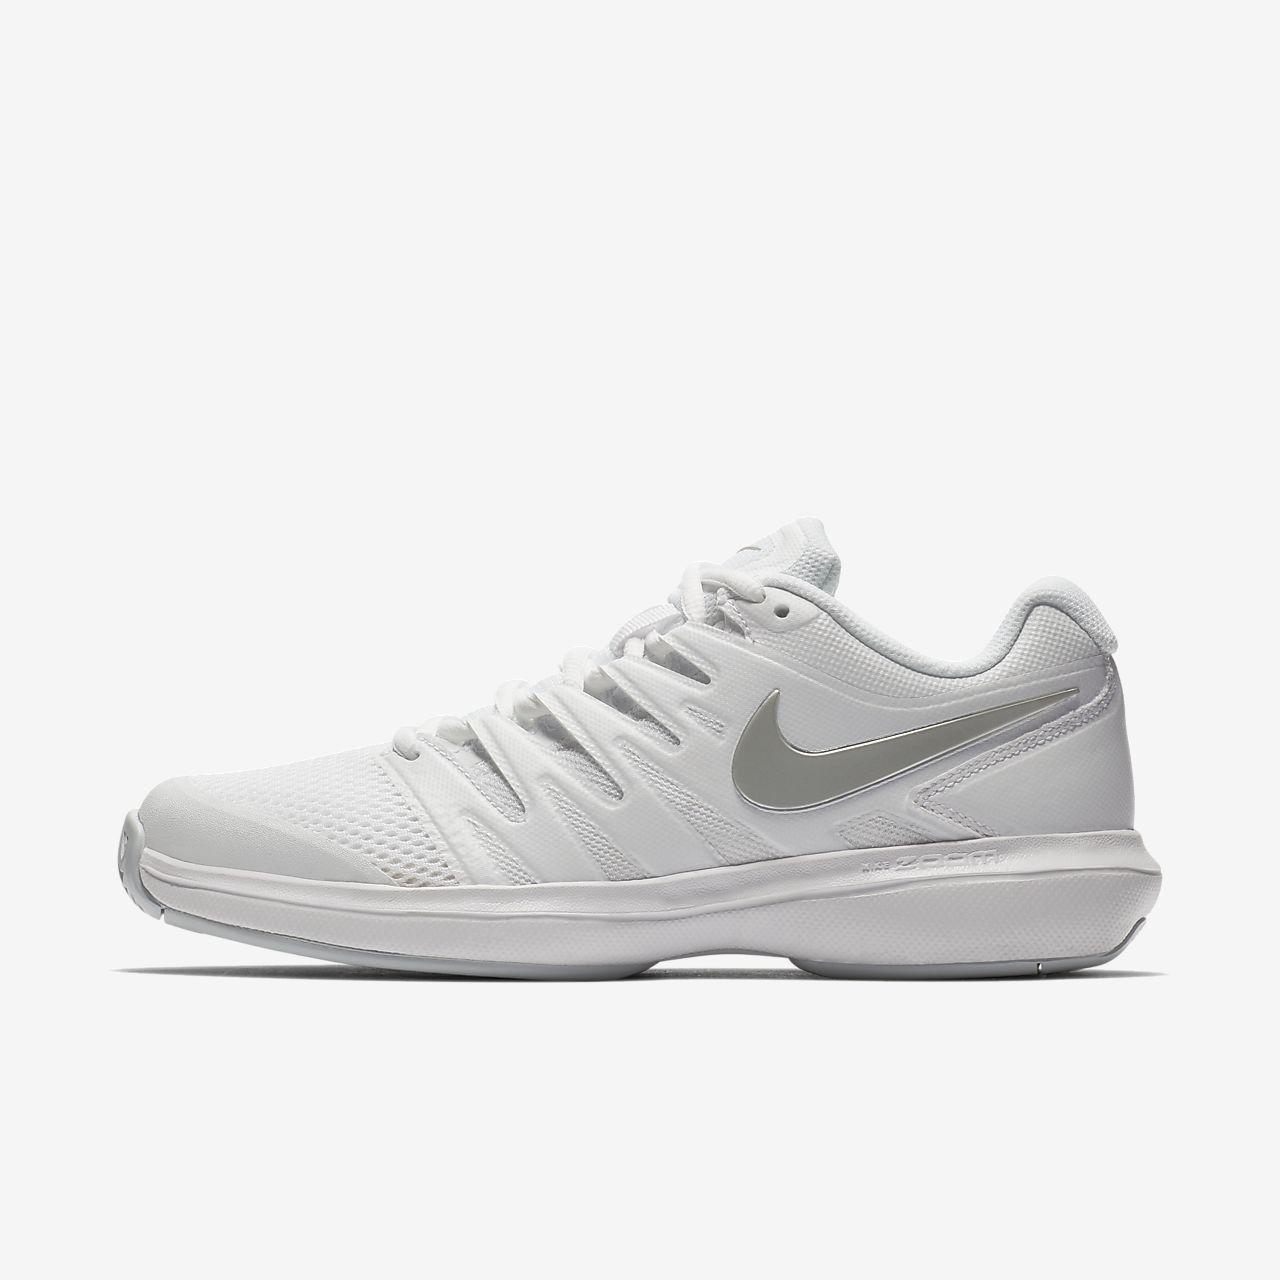 790656a396fb9 Nike Court Air Zoom Prestige Hard Women s Tennis Shoe - 8.5 Silver ...